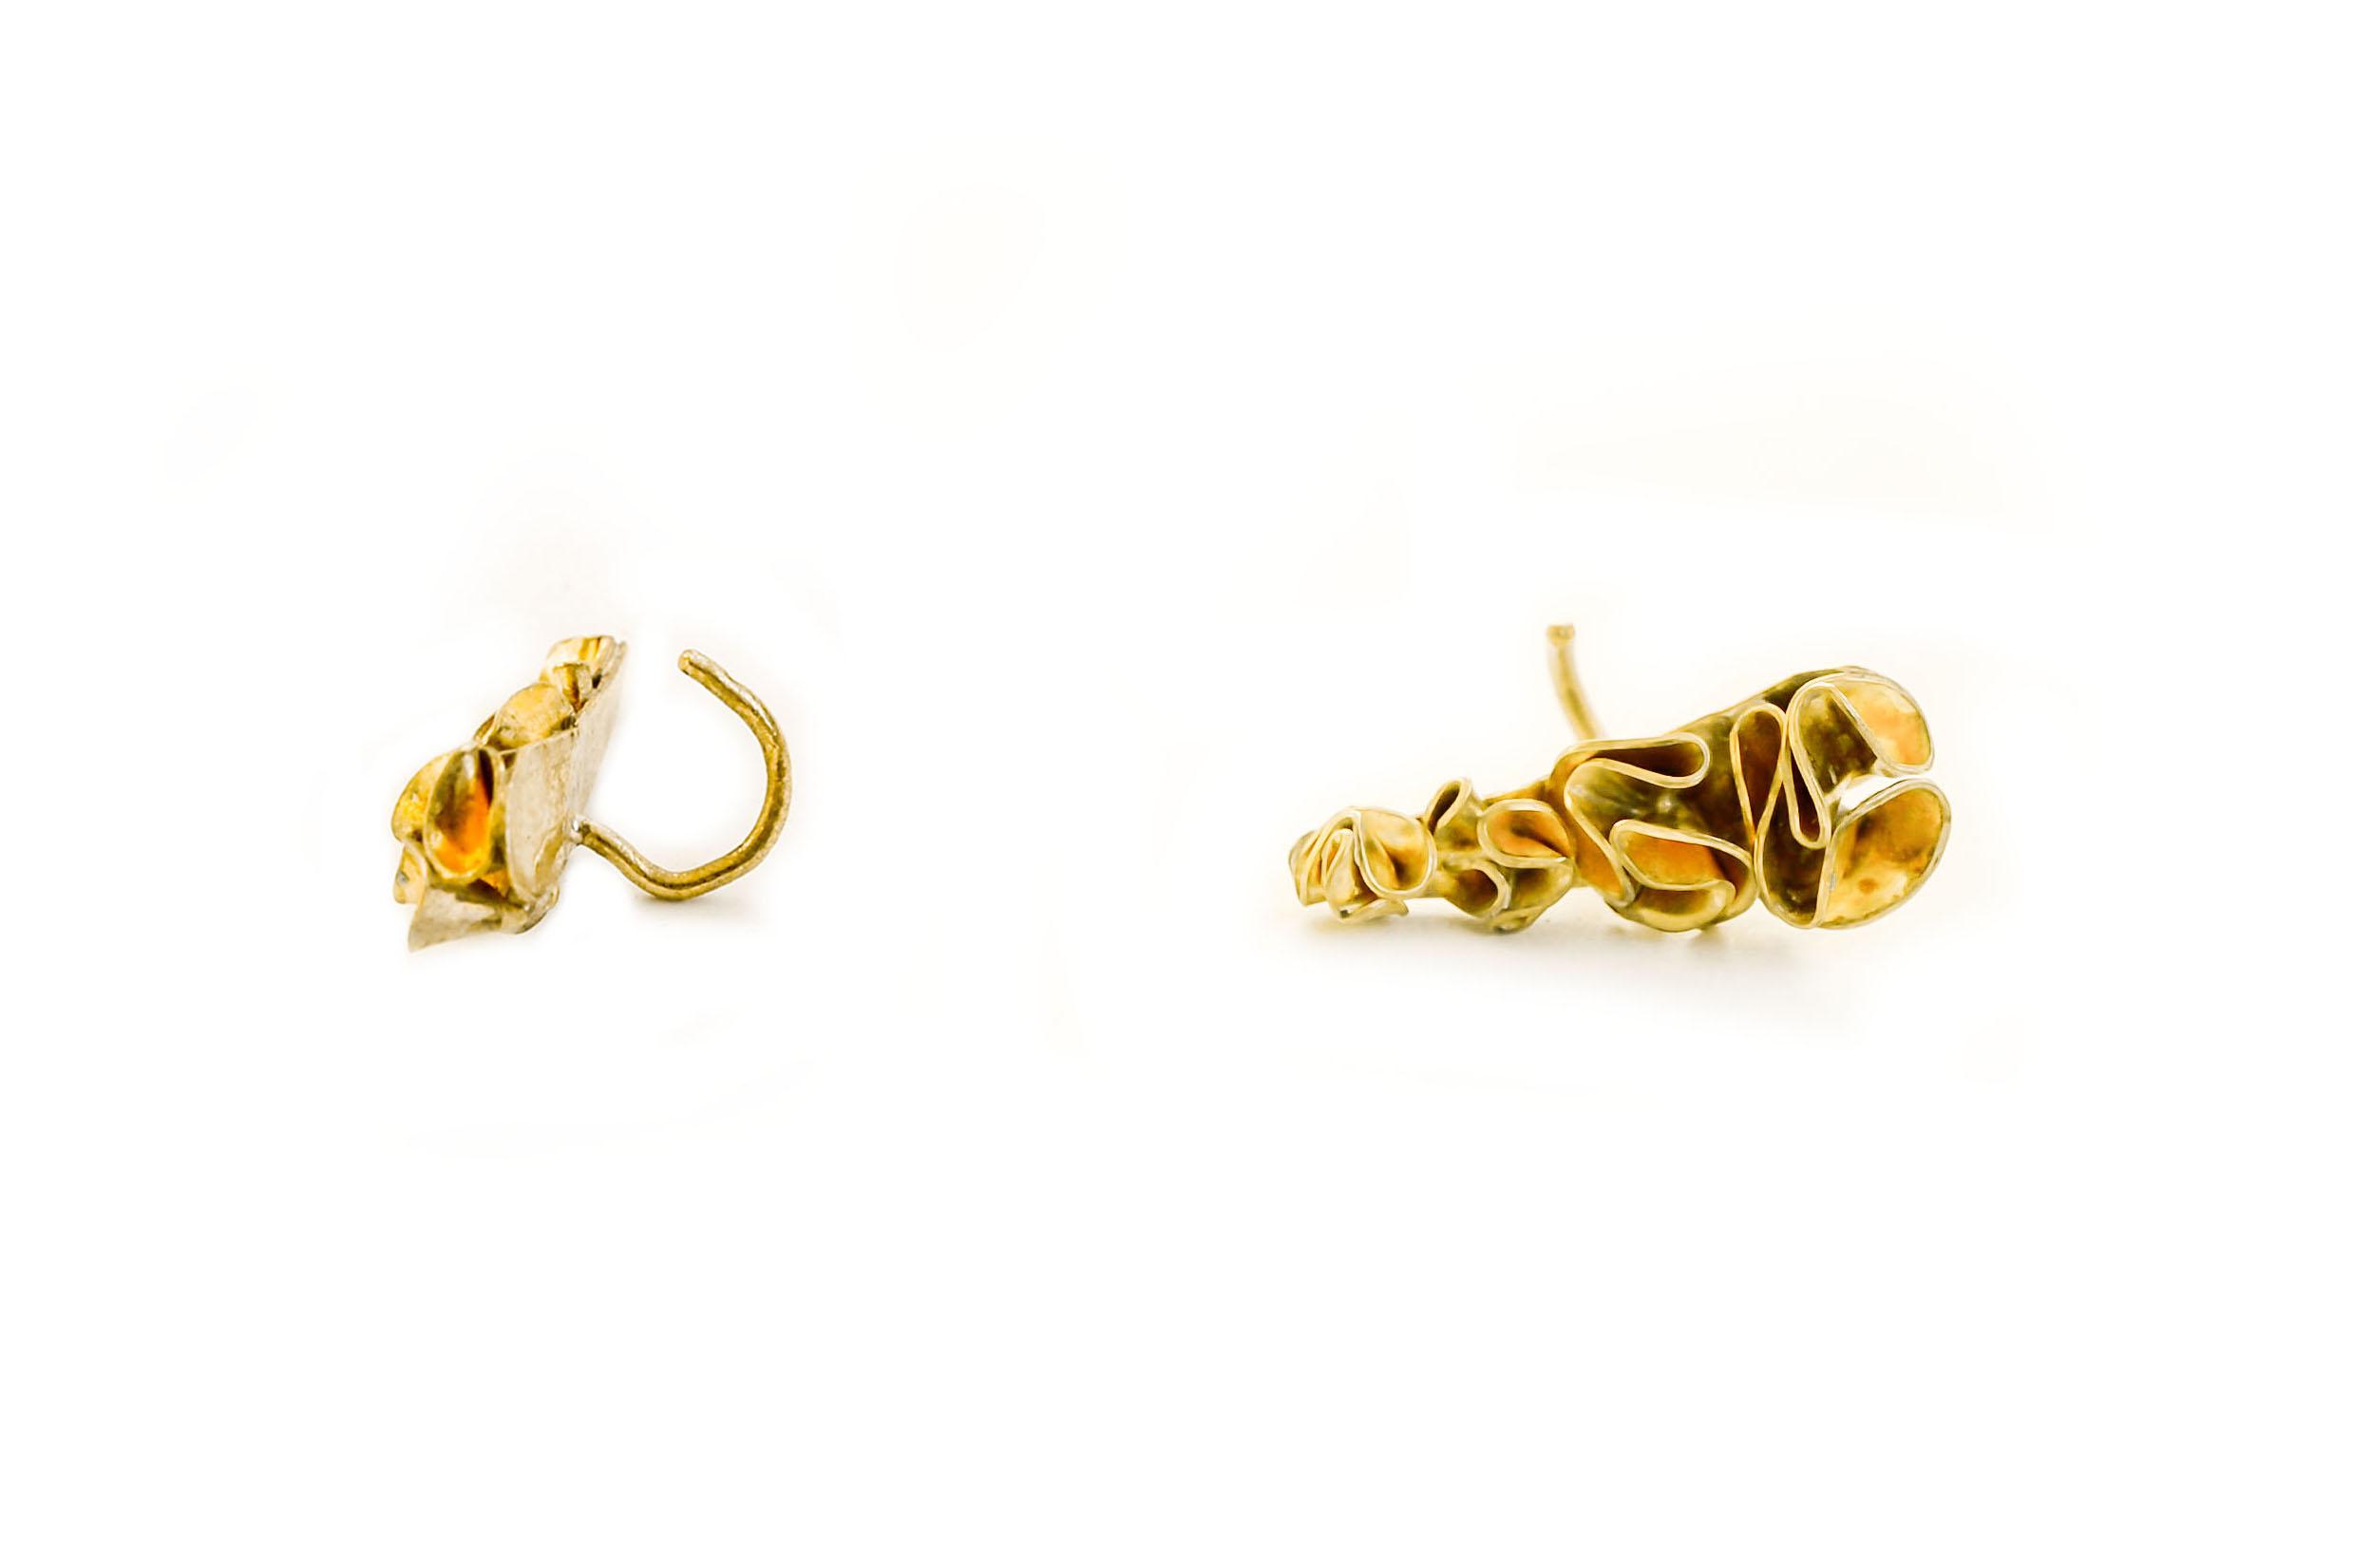 bijou d'oreille earcuff corolles bijou unique bijou délicat